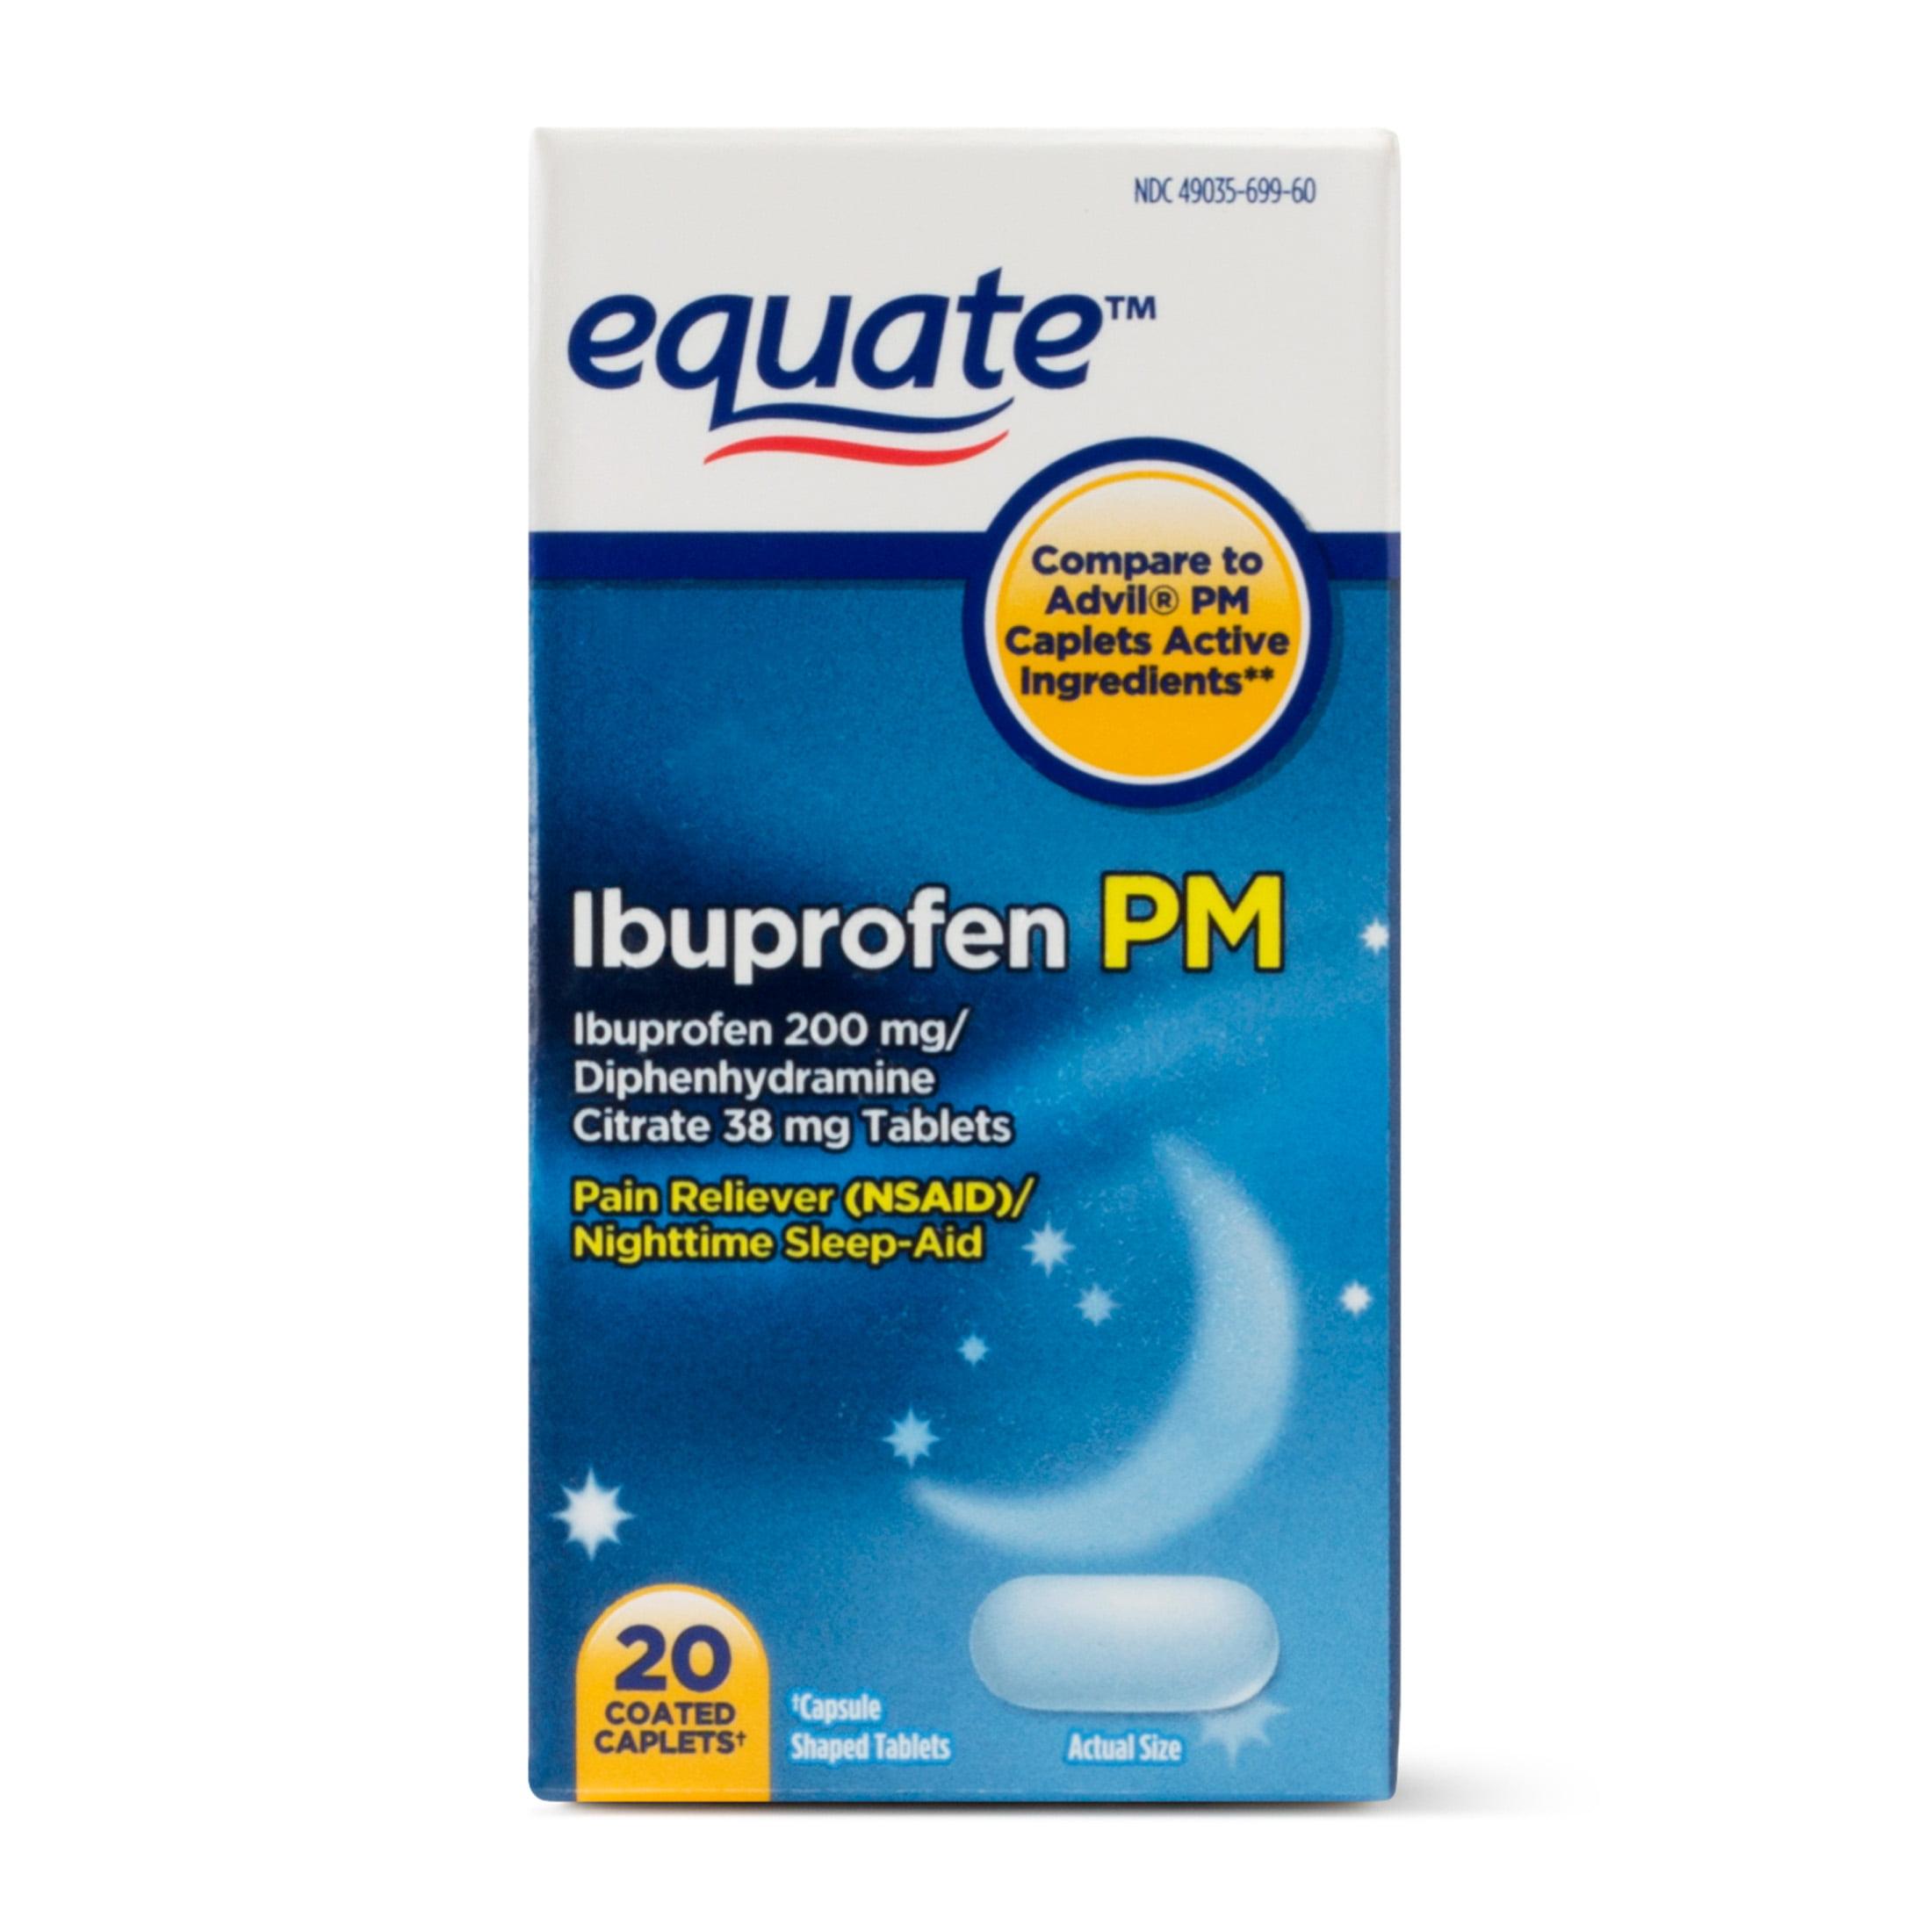 Equate Ibuprofen PM Caplets, 200 mg, 20 Ct